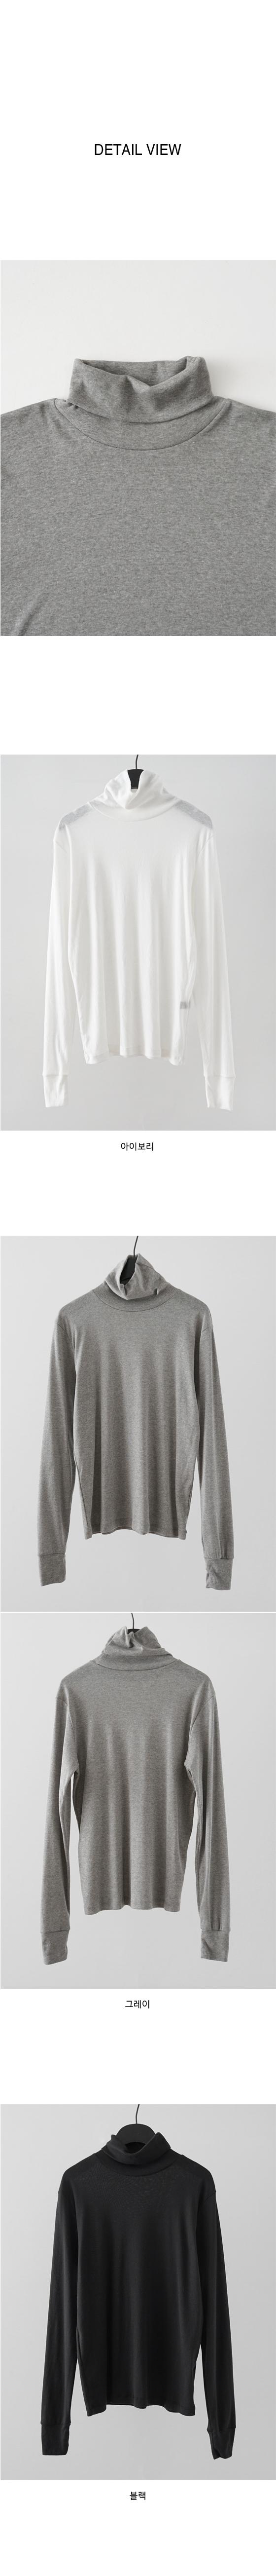 lazy neckline pola top